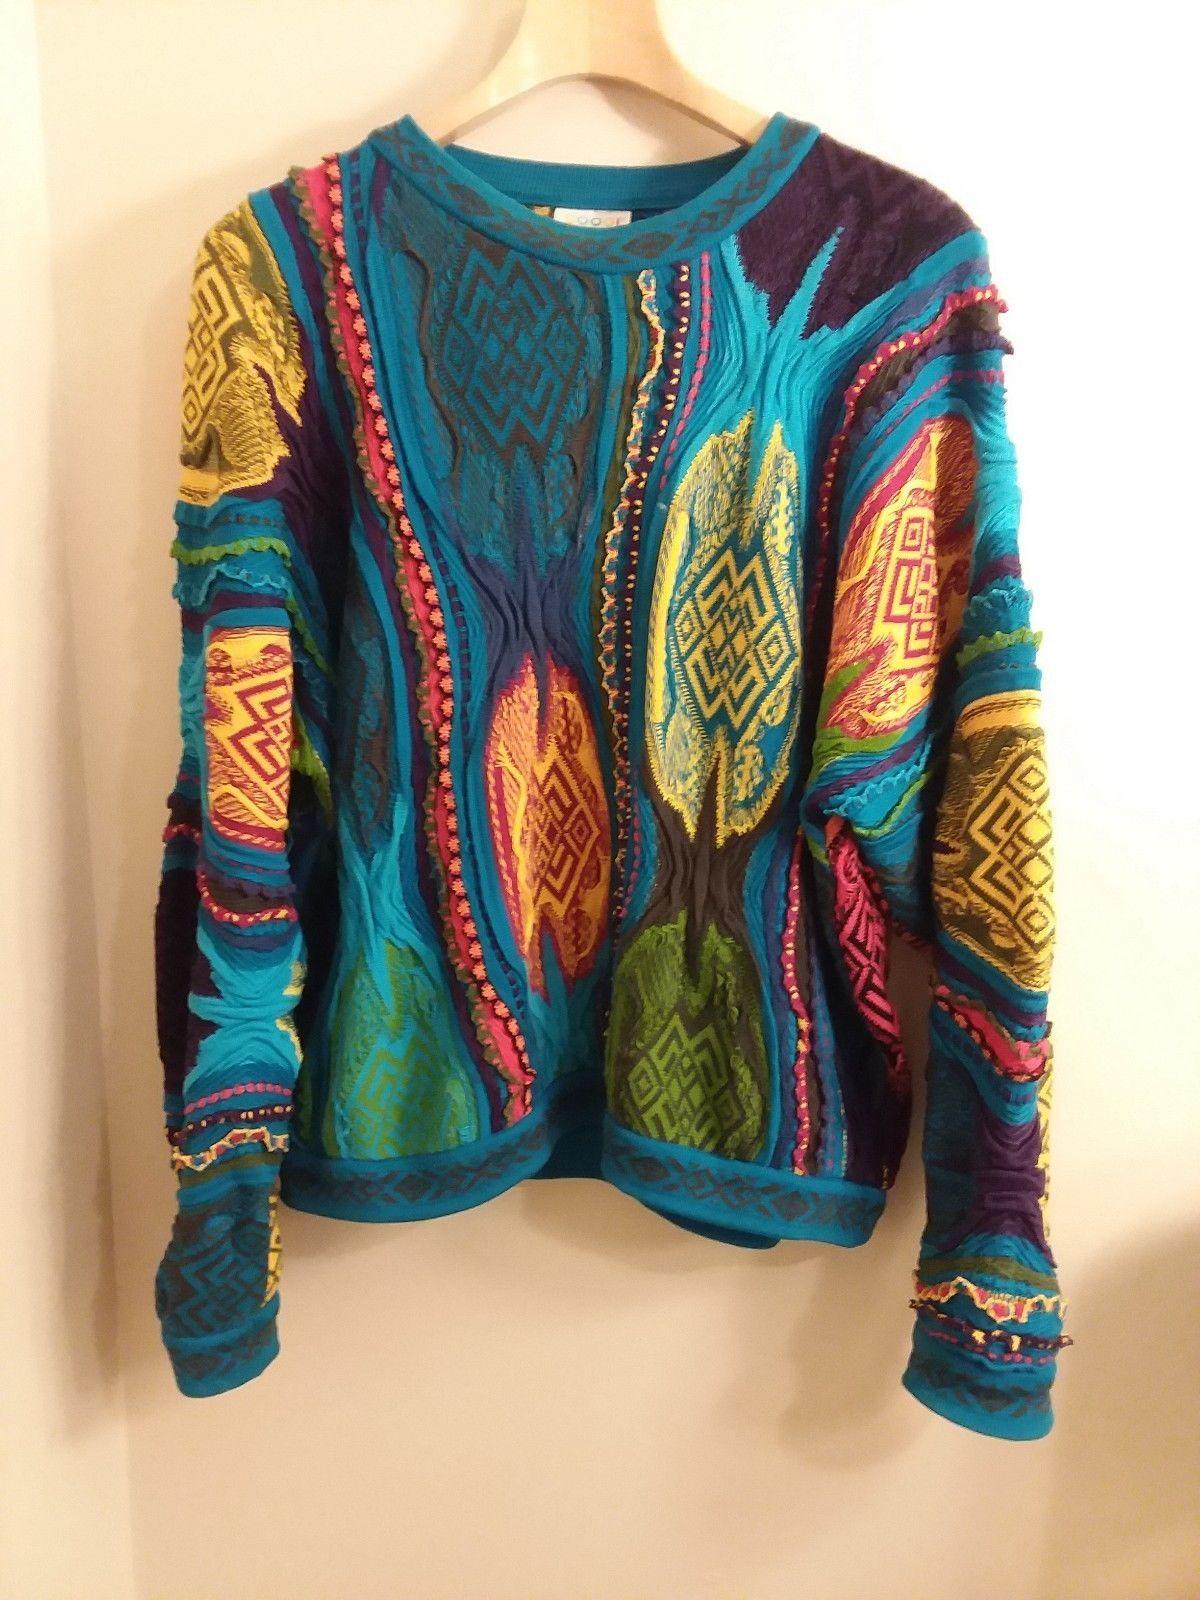 5d42d5ae82d 90s Vtg COOGI Australia blue Sweater XL CRAZY KNIT mercerised cotton ...